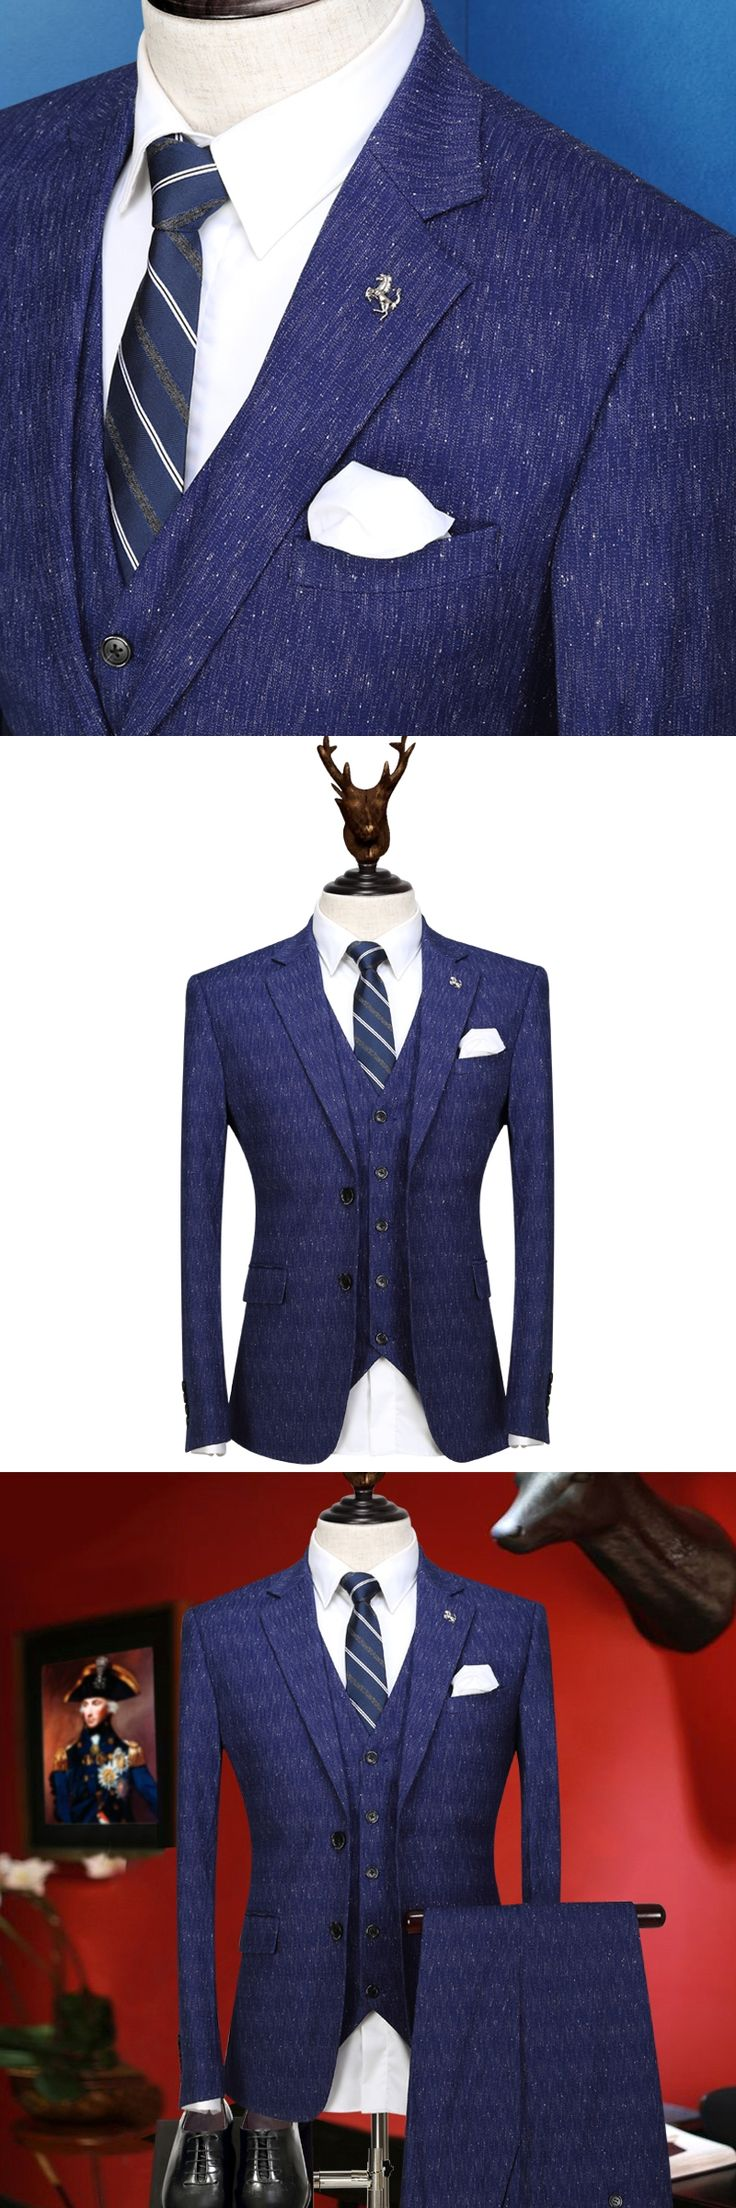 men suit new arrivals retro blue wedding groom wear fashion young man suits set 3 pieces blazer vest pant single breasted tuxedo